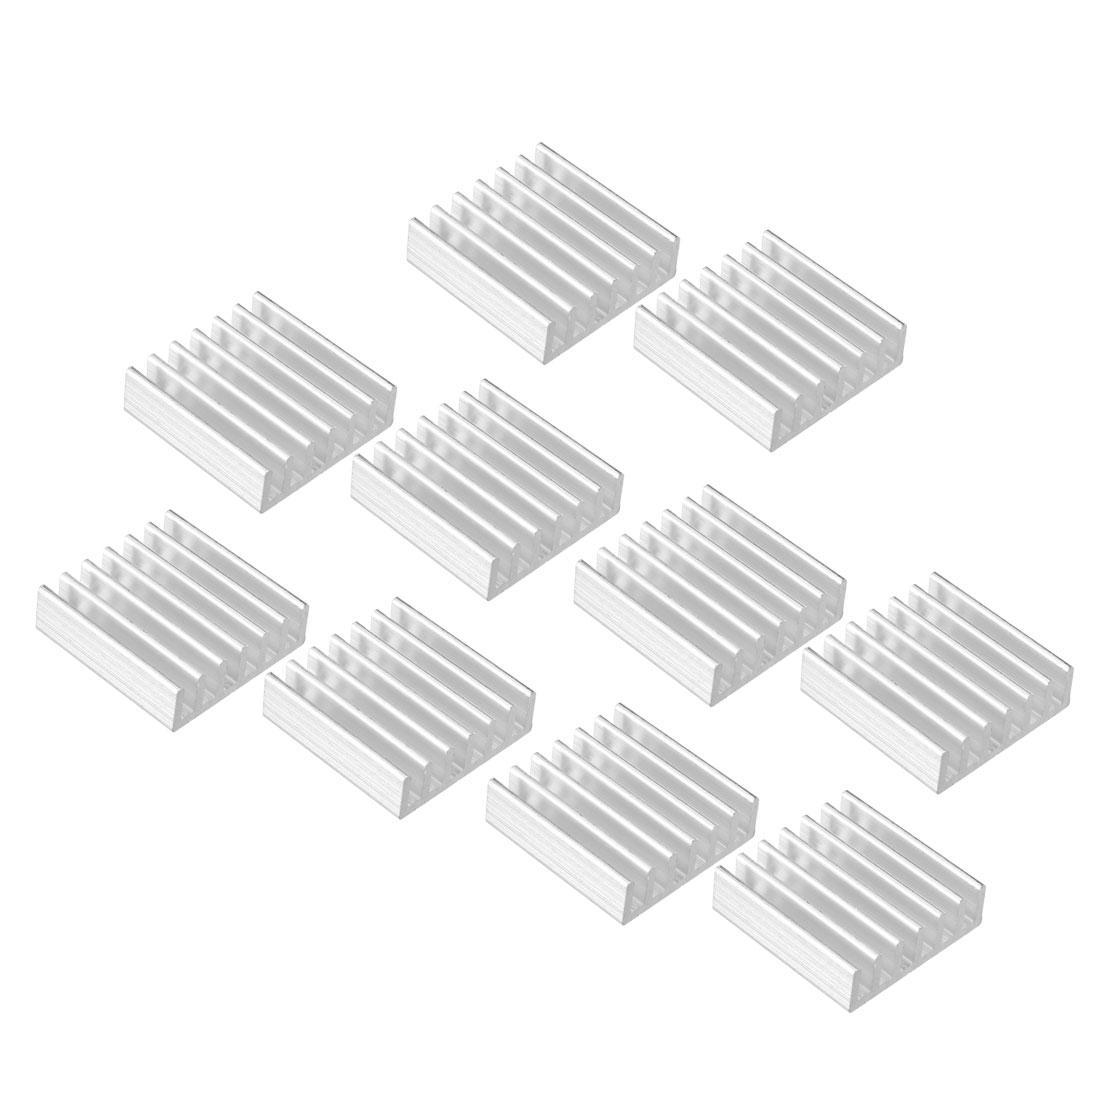 Aluminum Heatsink Cooler Circuit Board Cooling Silver Tone 20mmx20mmx6mm 10Pcs